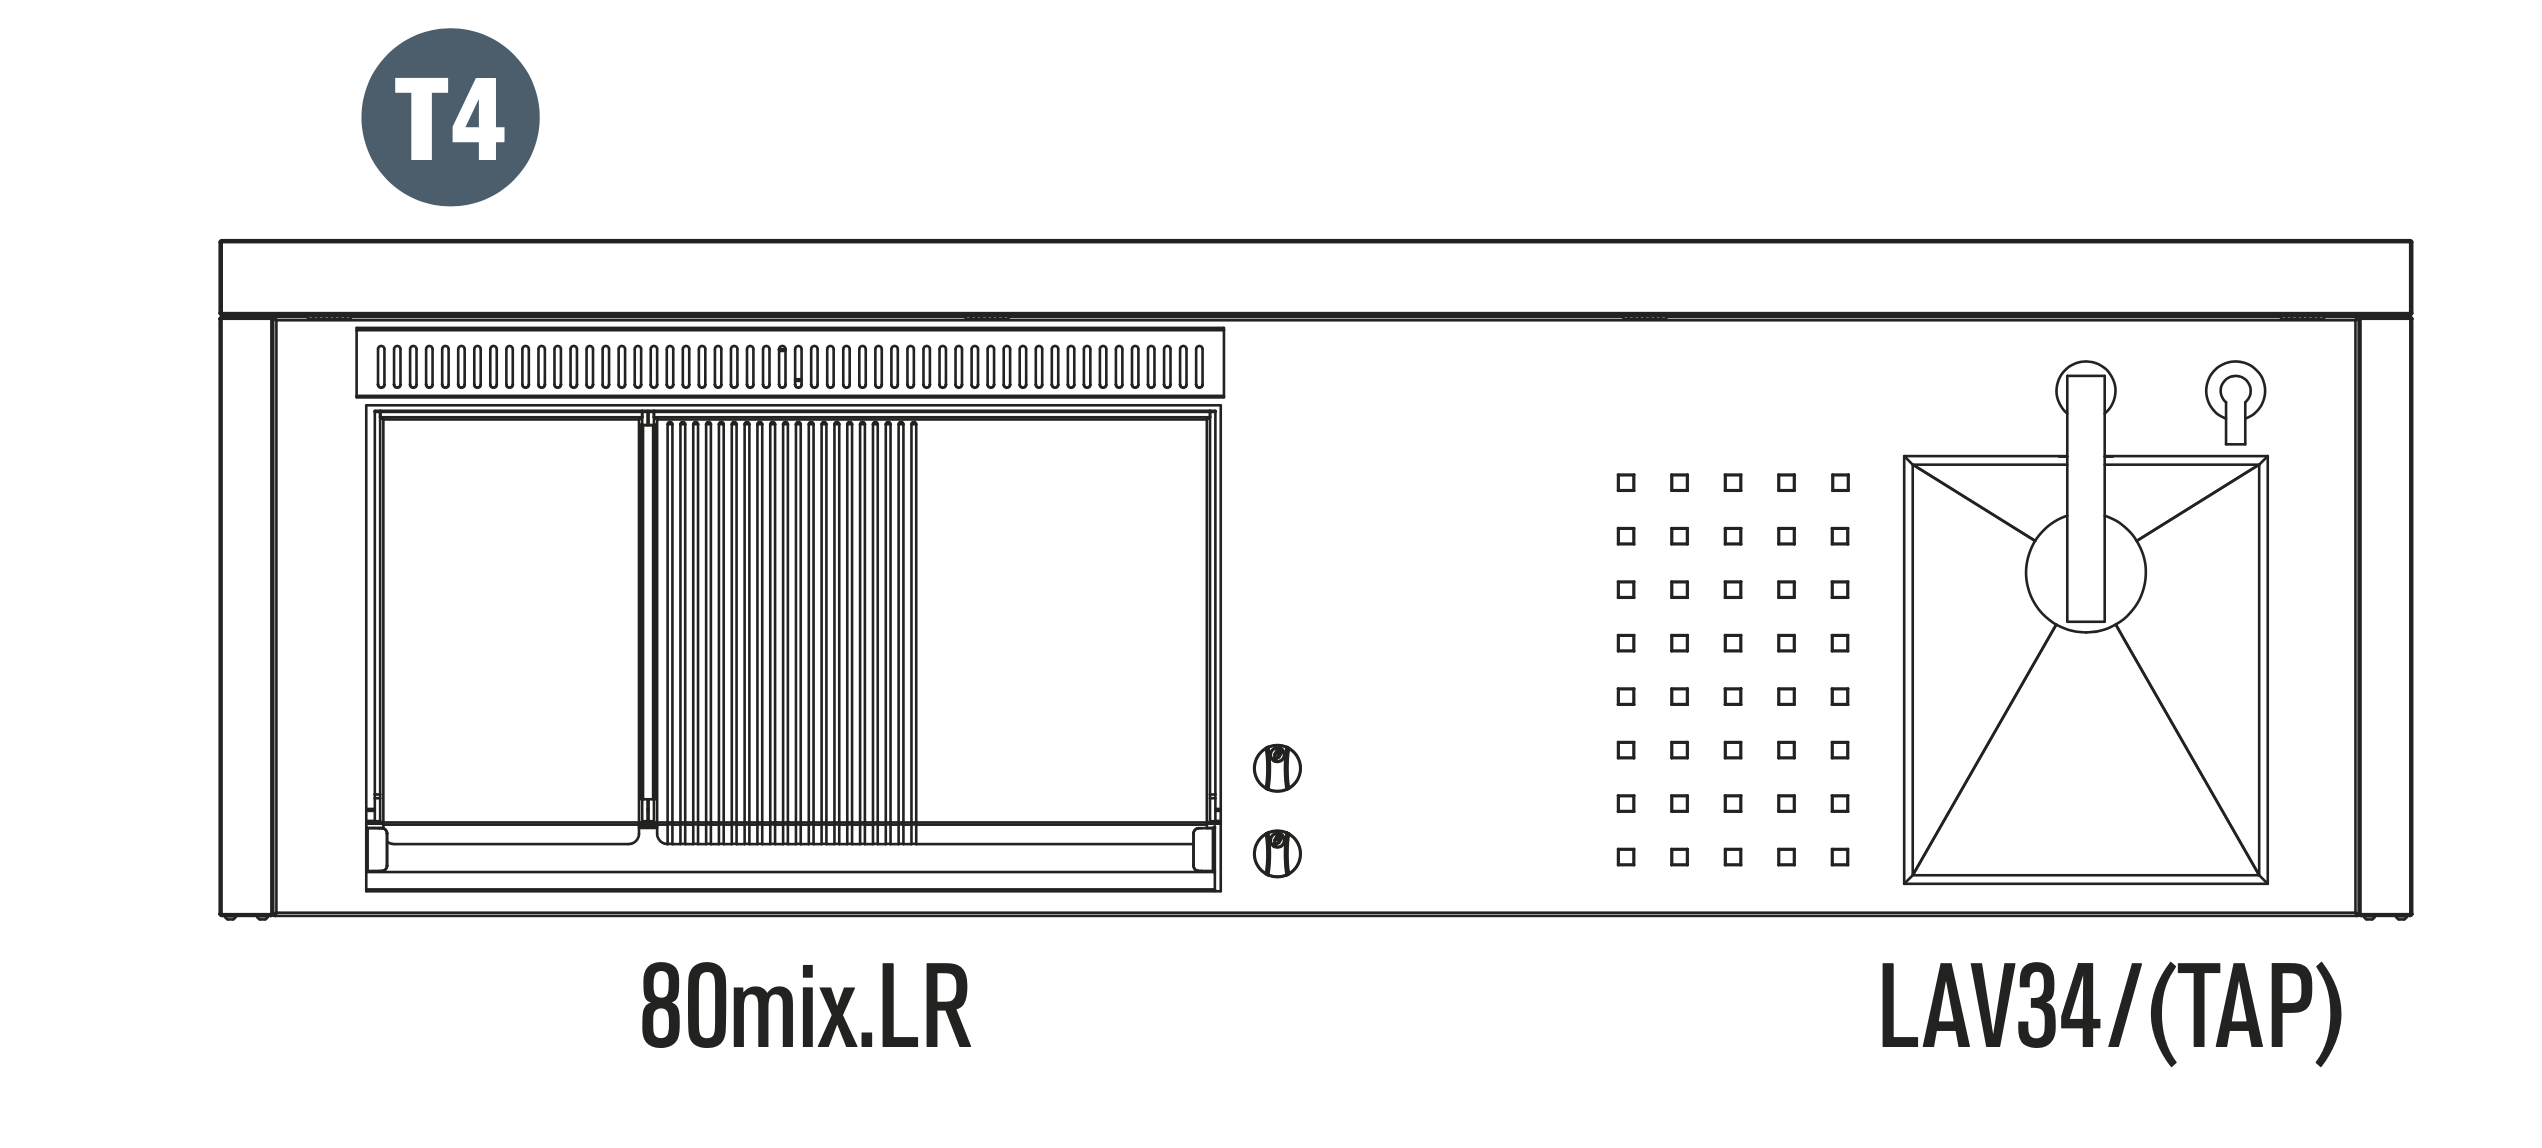 OASI Serie Outdoorküche 205 - C5 T4 (IN 80 MIX LR)